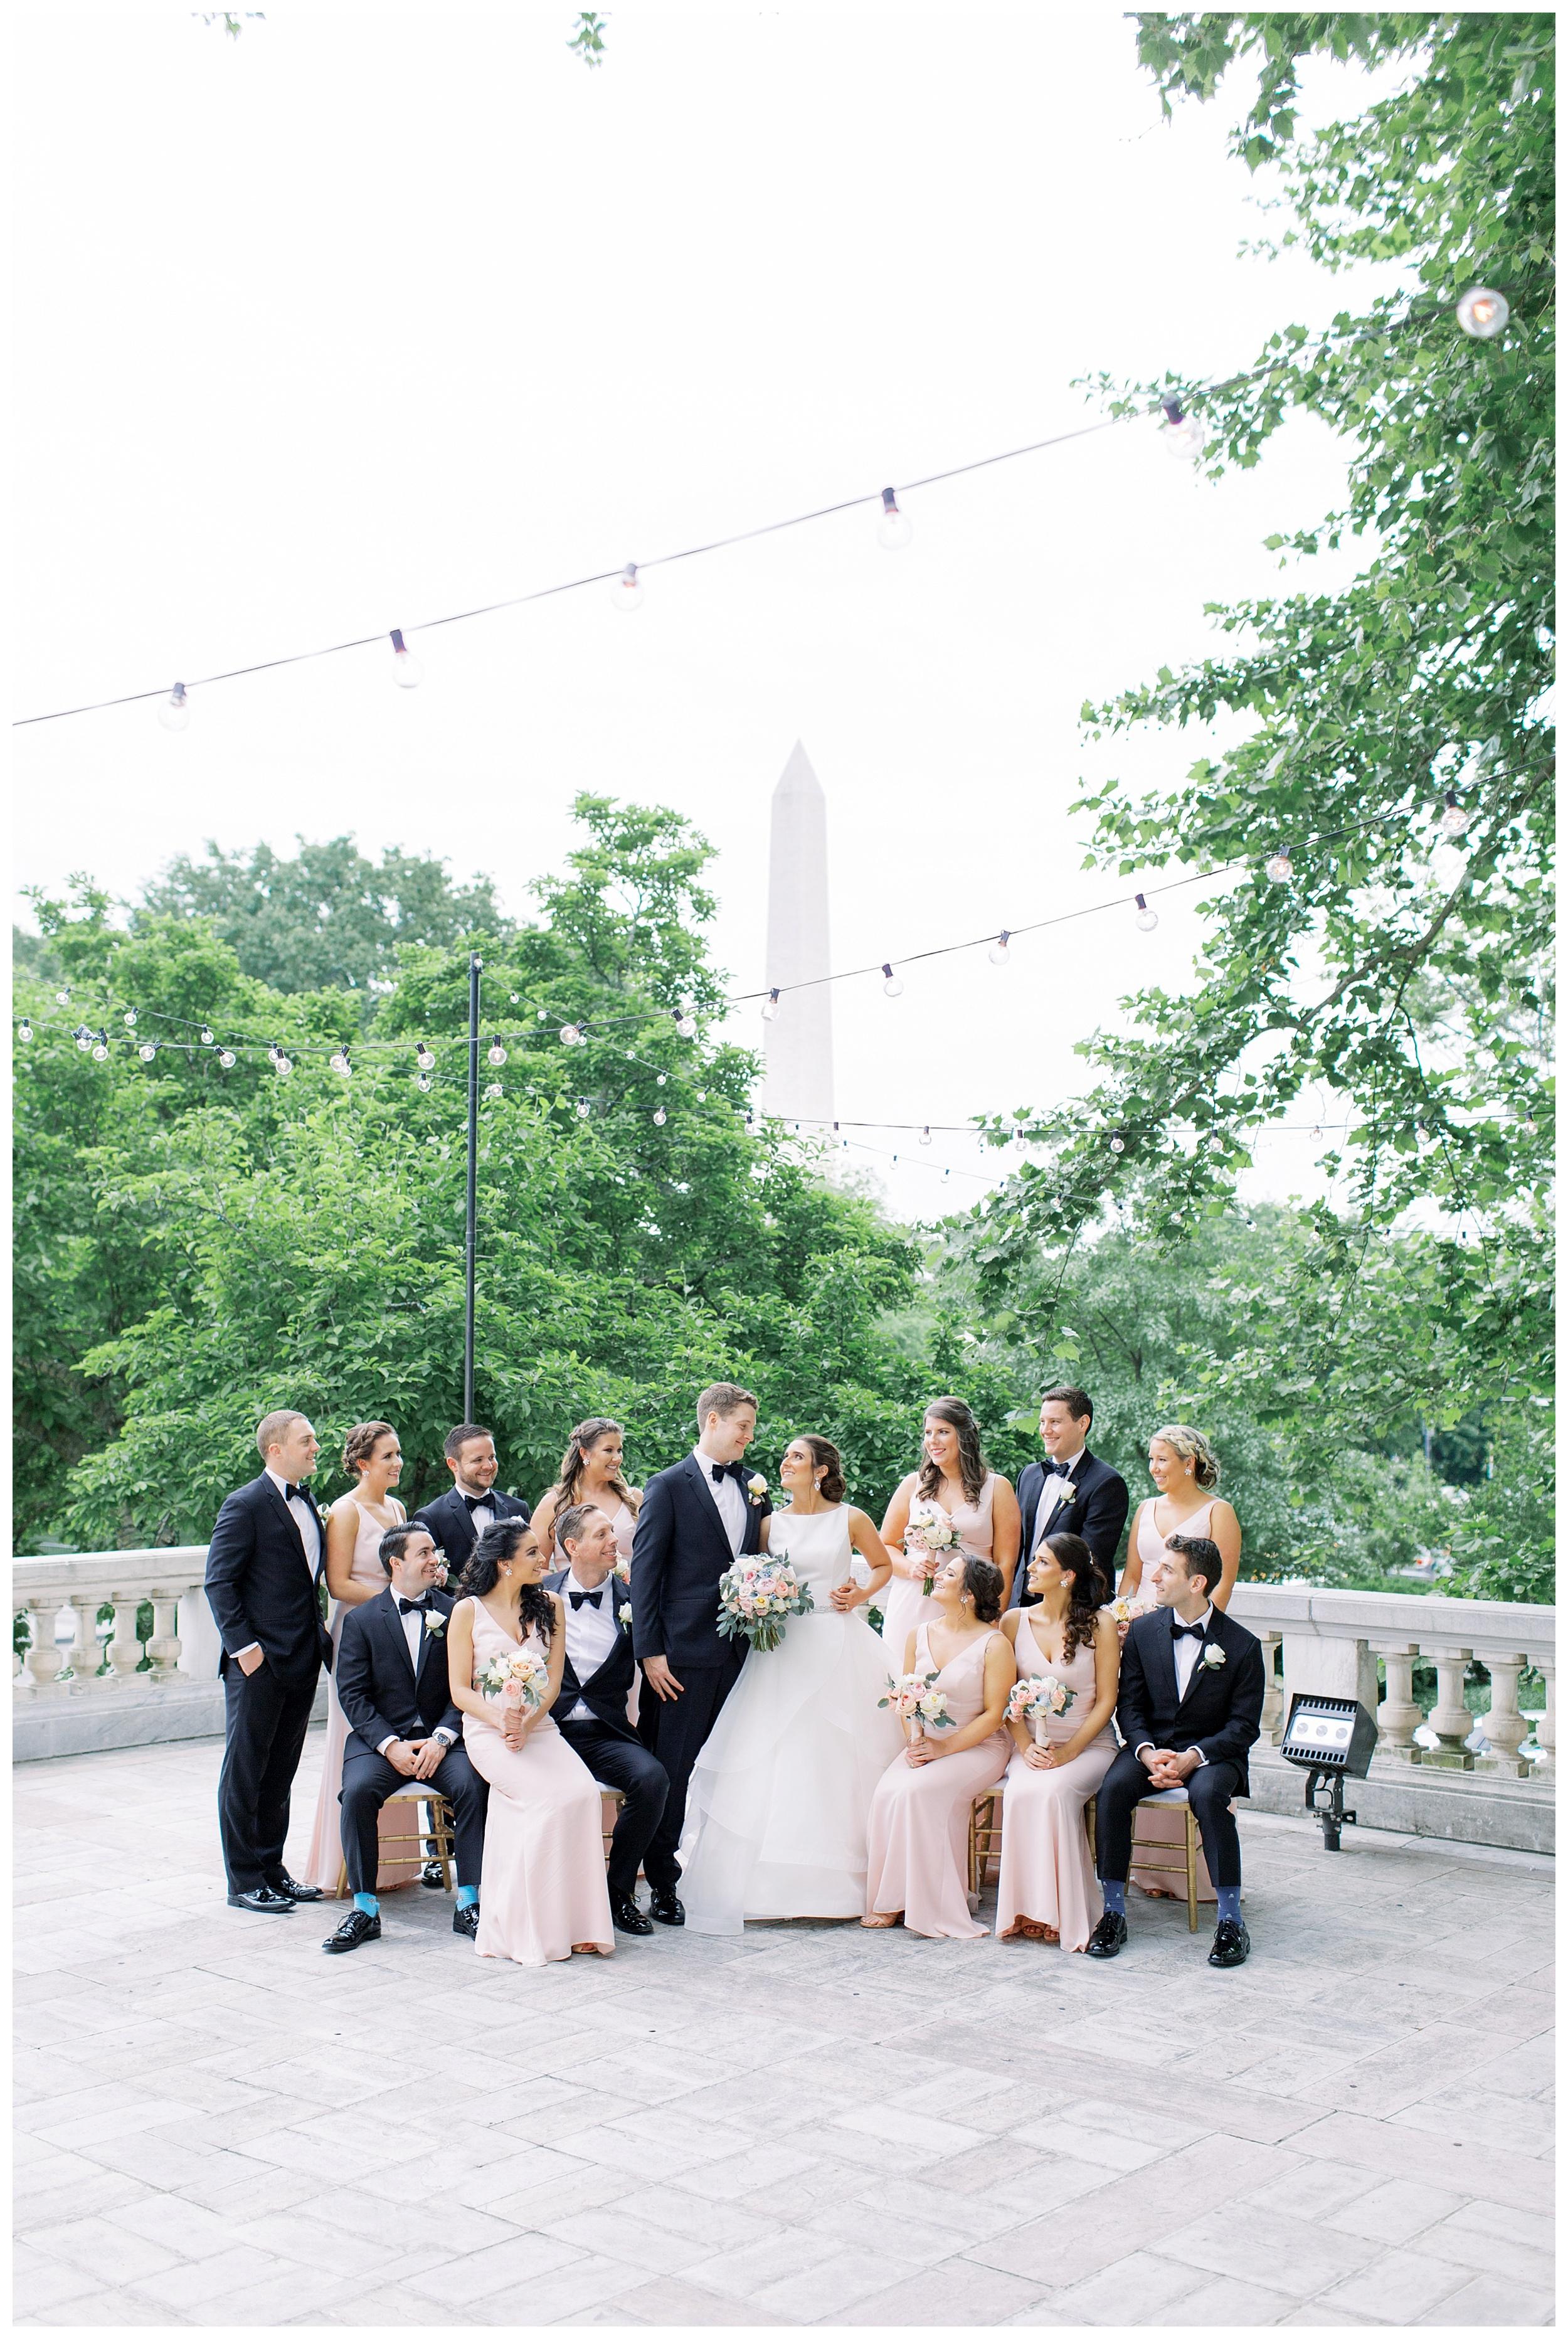 DAR Constitution Hall Wedding Wedding | Daughters of the American Revolution Wedding | District of Columbia Film Wedding Photographer Kir Tuben_0072.jpg